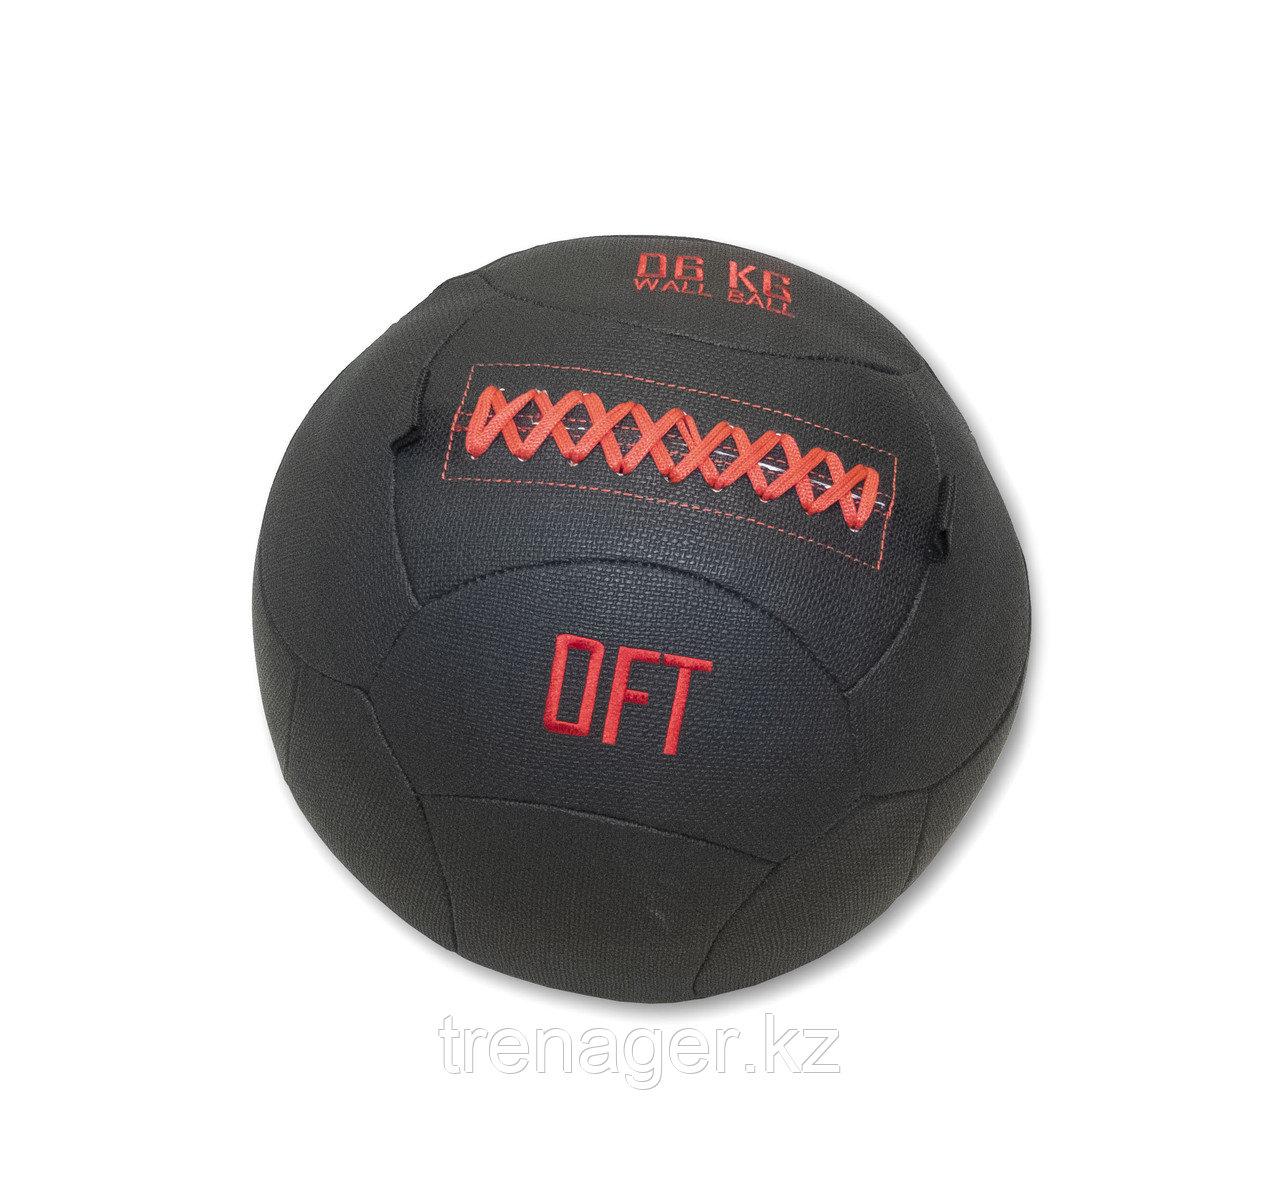 Тренировочный мяч Wall Ball Deluxe 6 кг